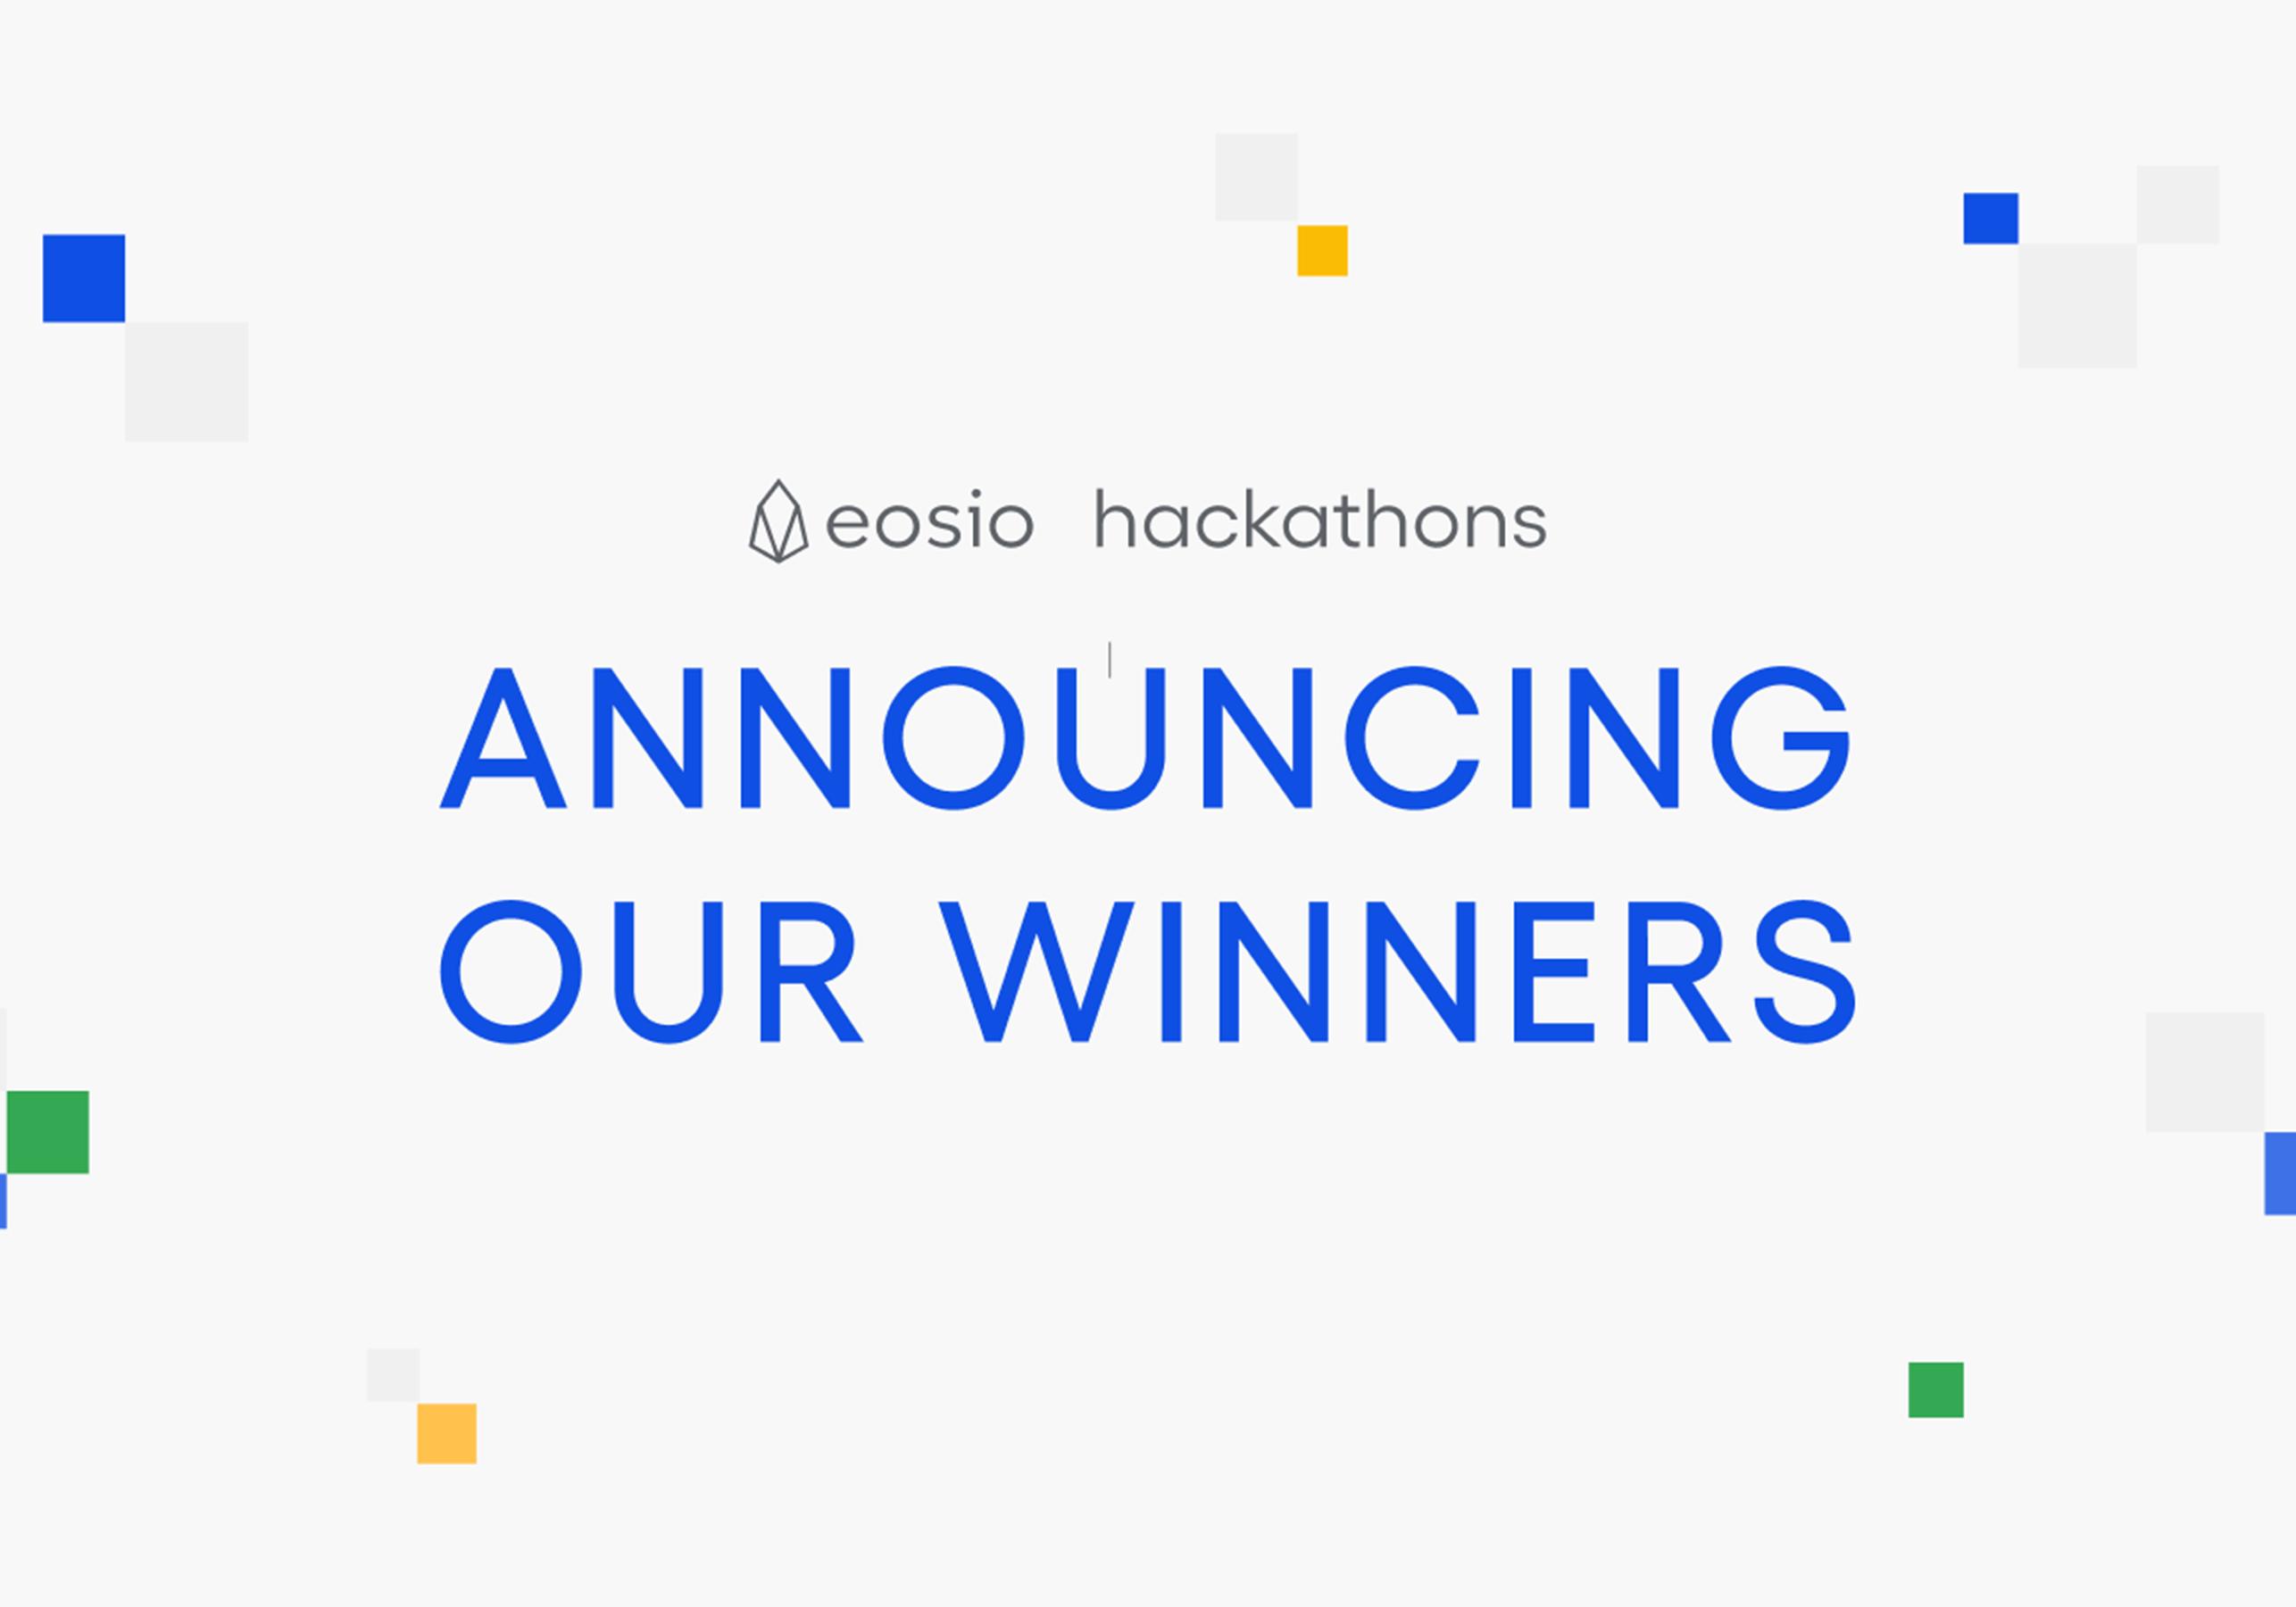 Hackathon Winner Announcement - featured image